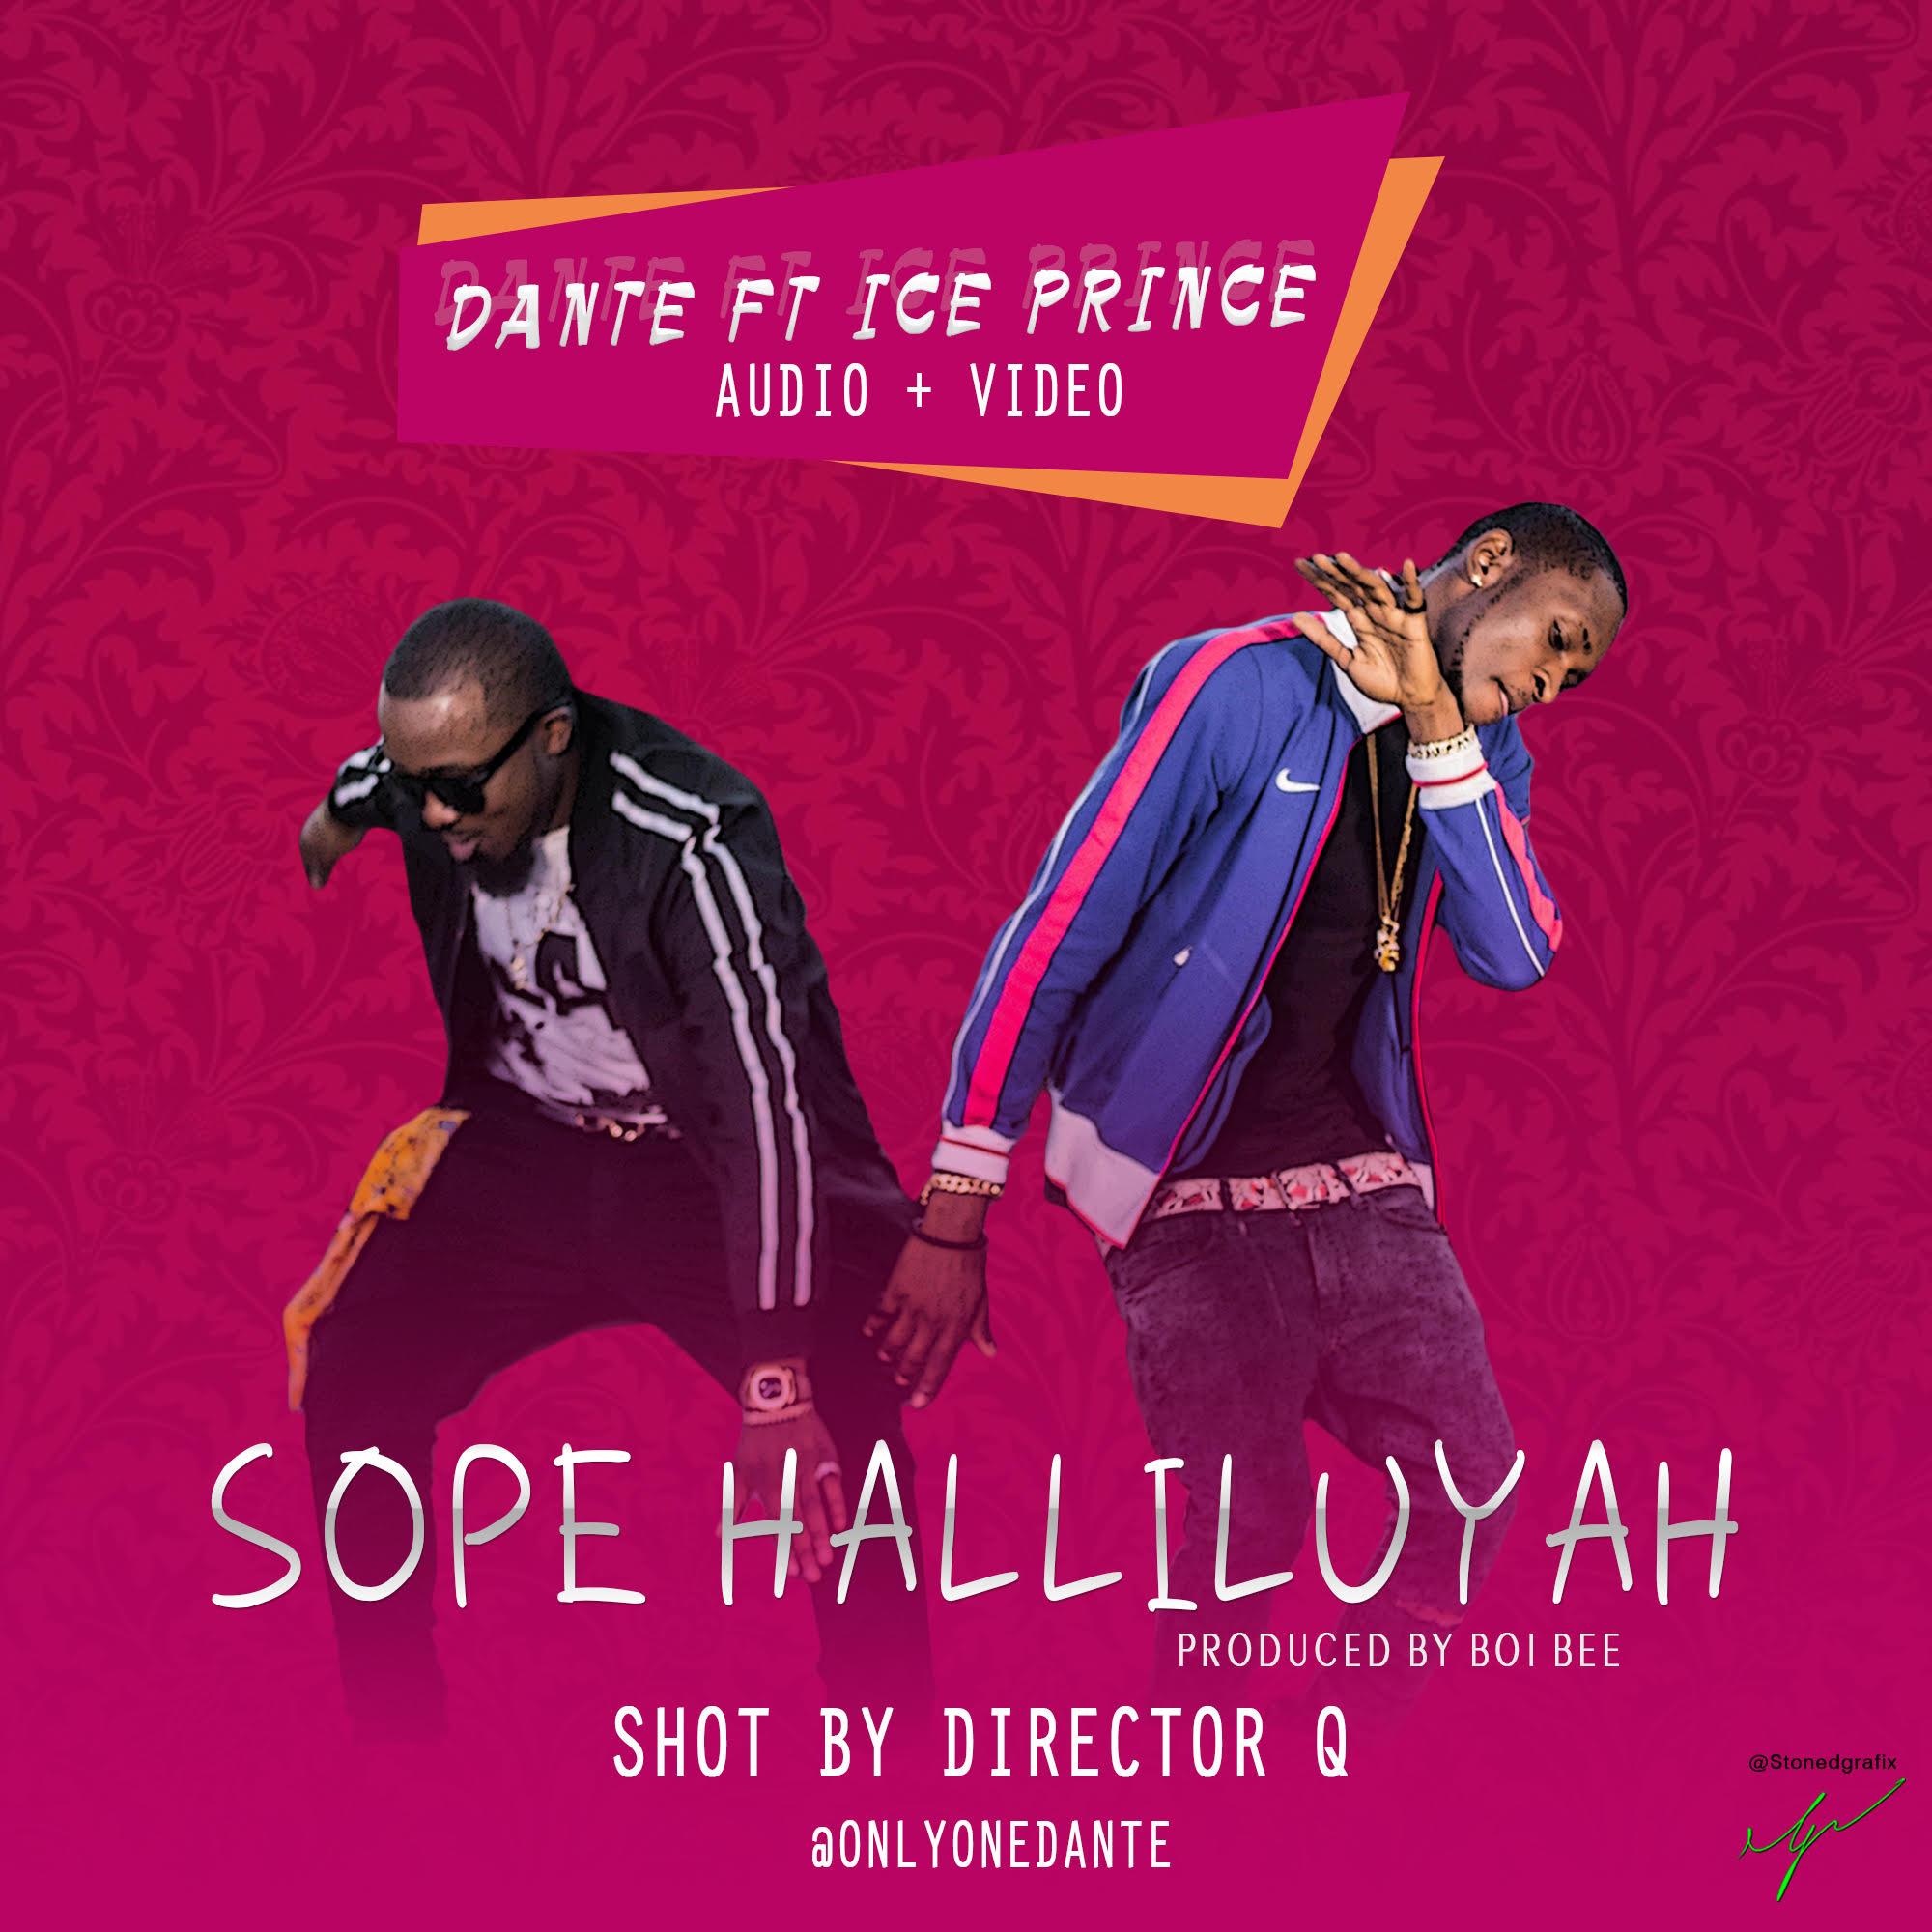 Photo of VIDEO + AUDIO: Dante ft Ice Prince – Sope Halleluyah